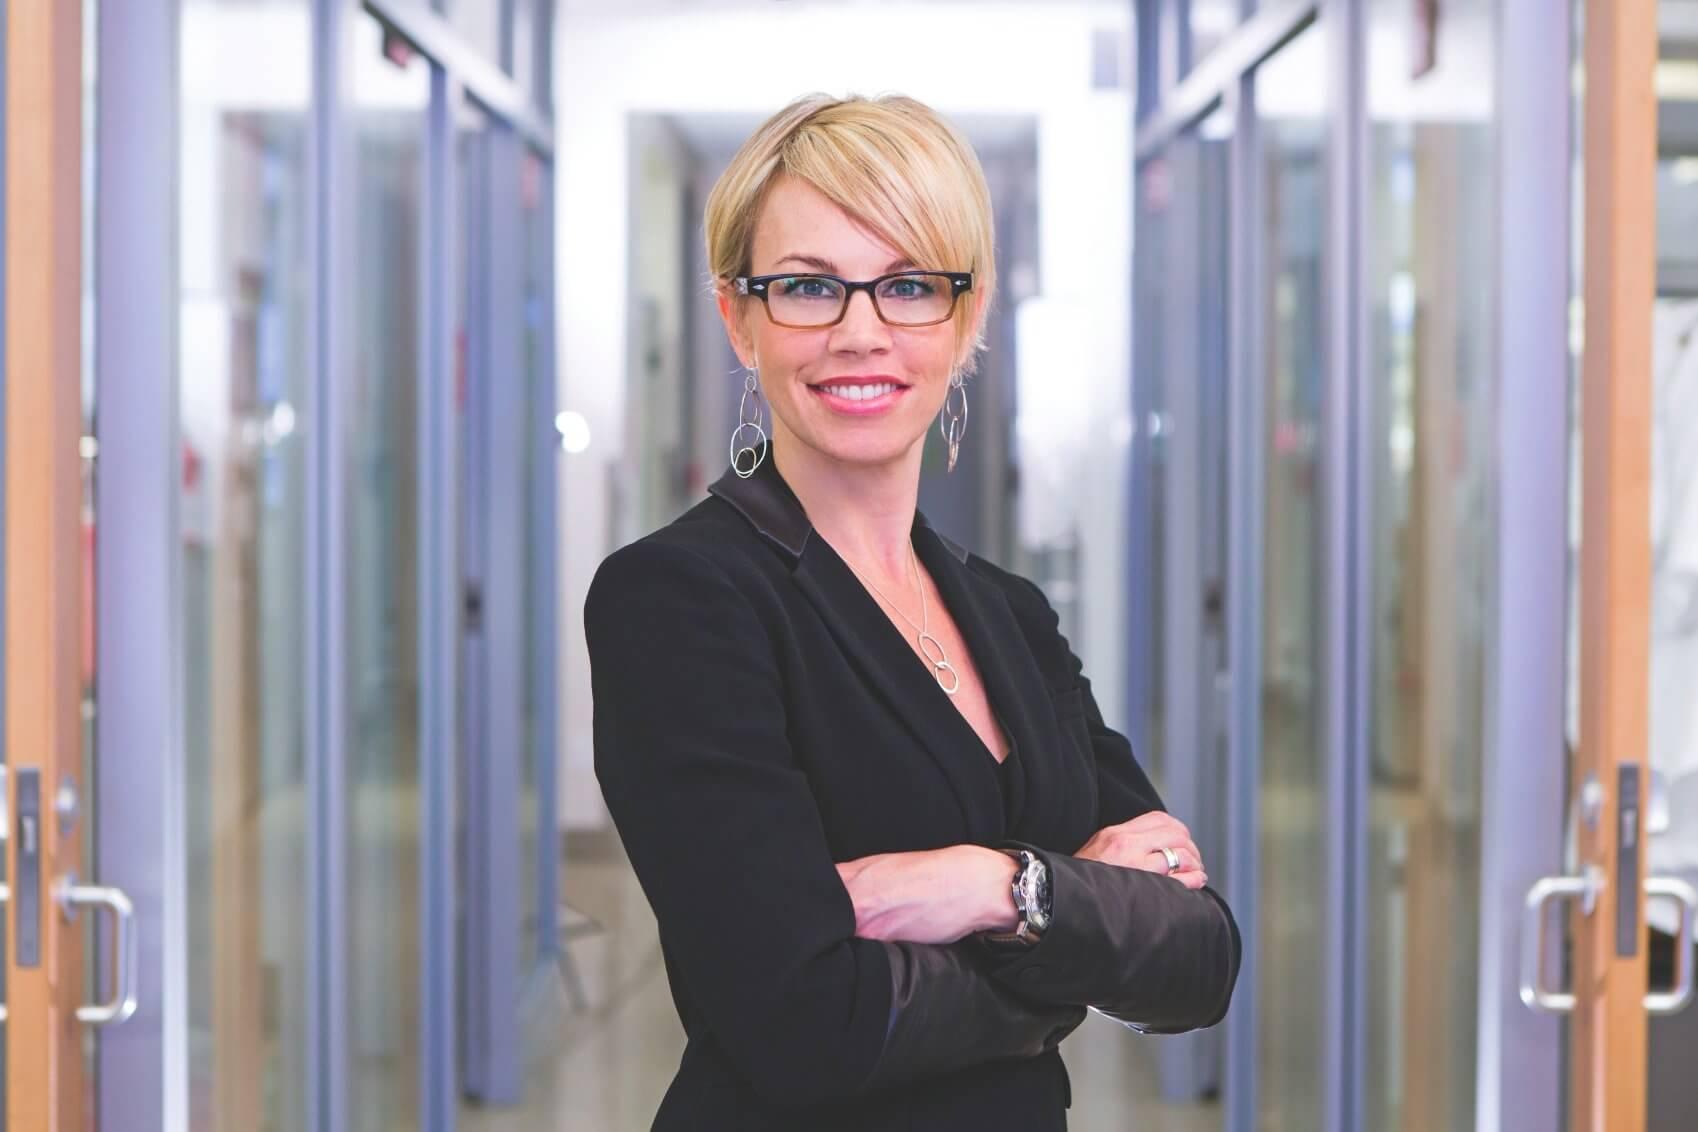 Melinda Richter, head of JLABS